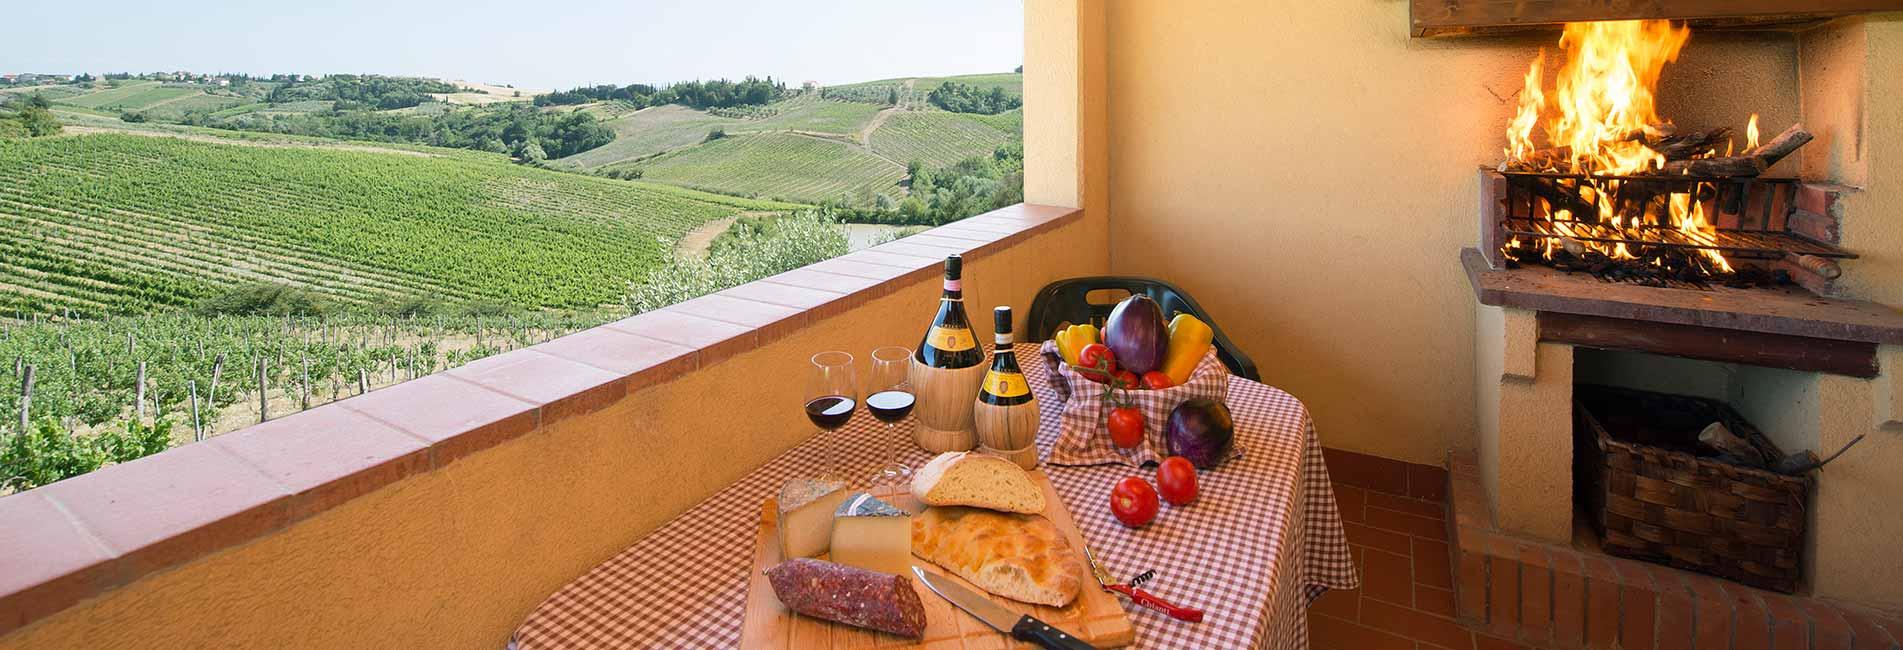 borgo_filicardo_apartments_chianti_tuscany6